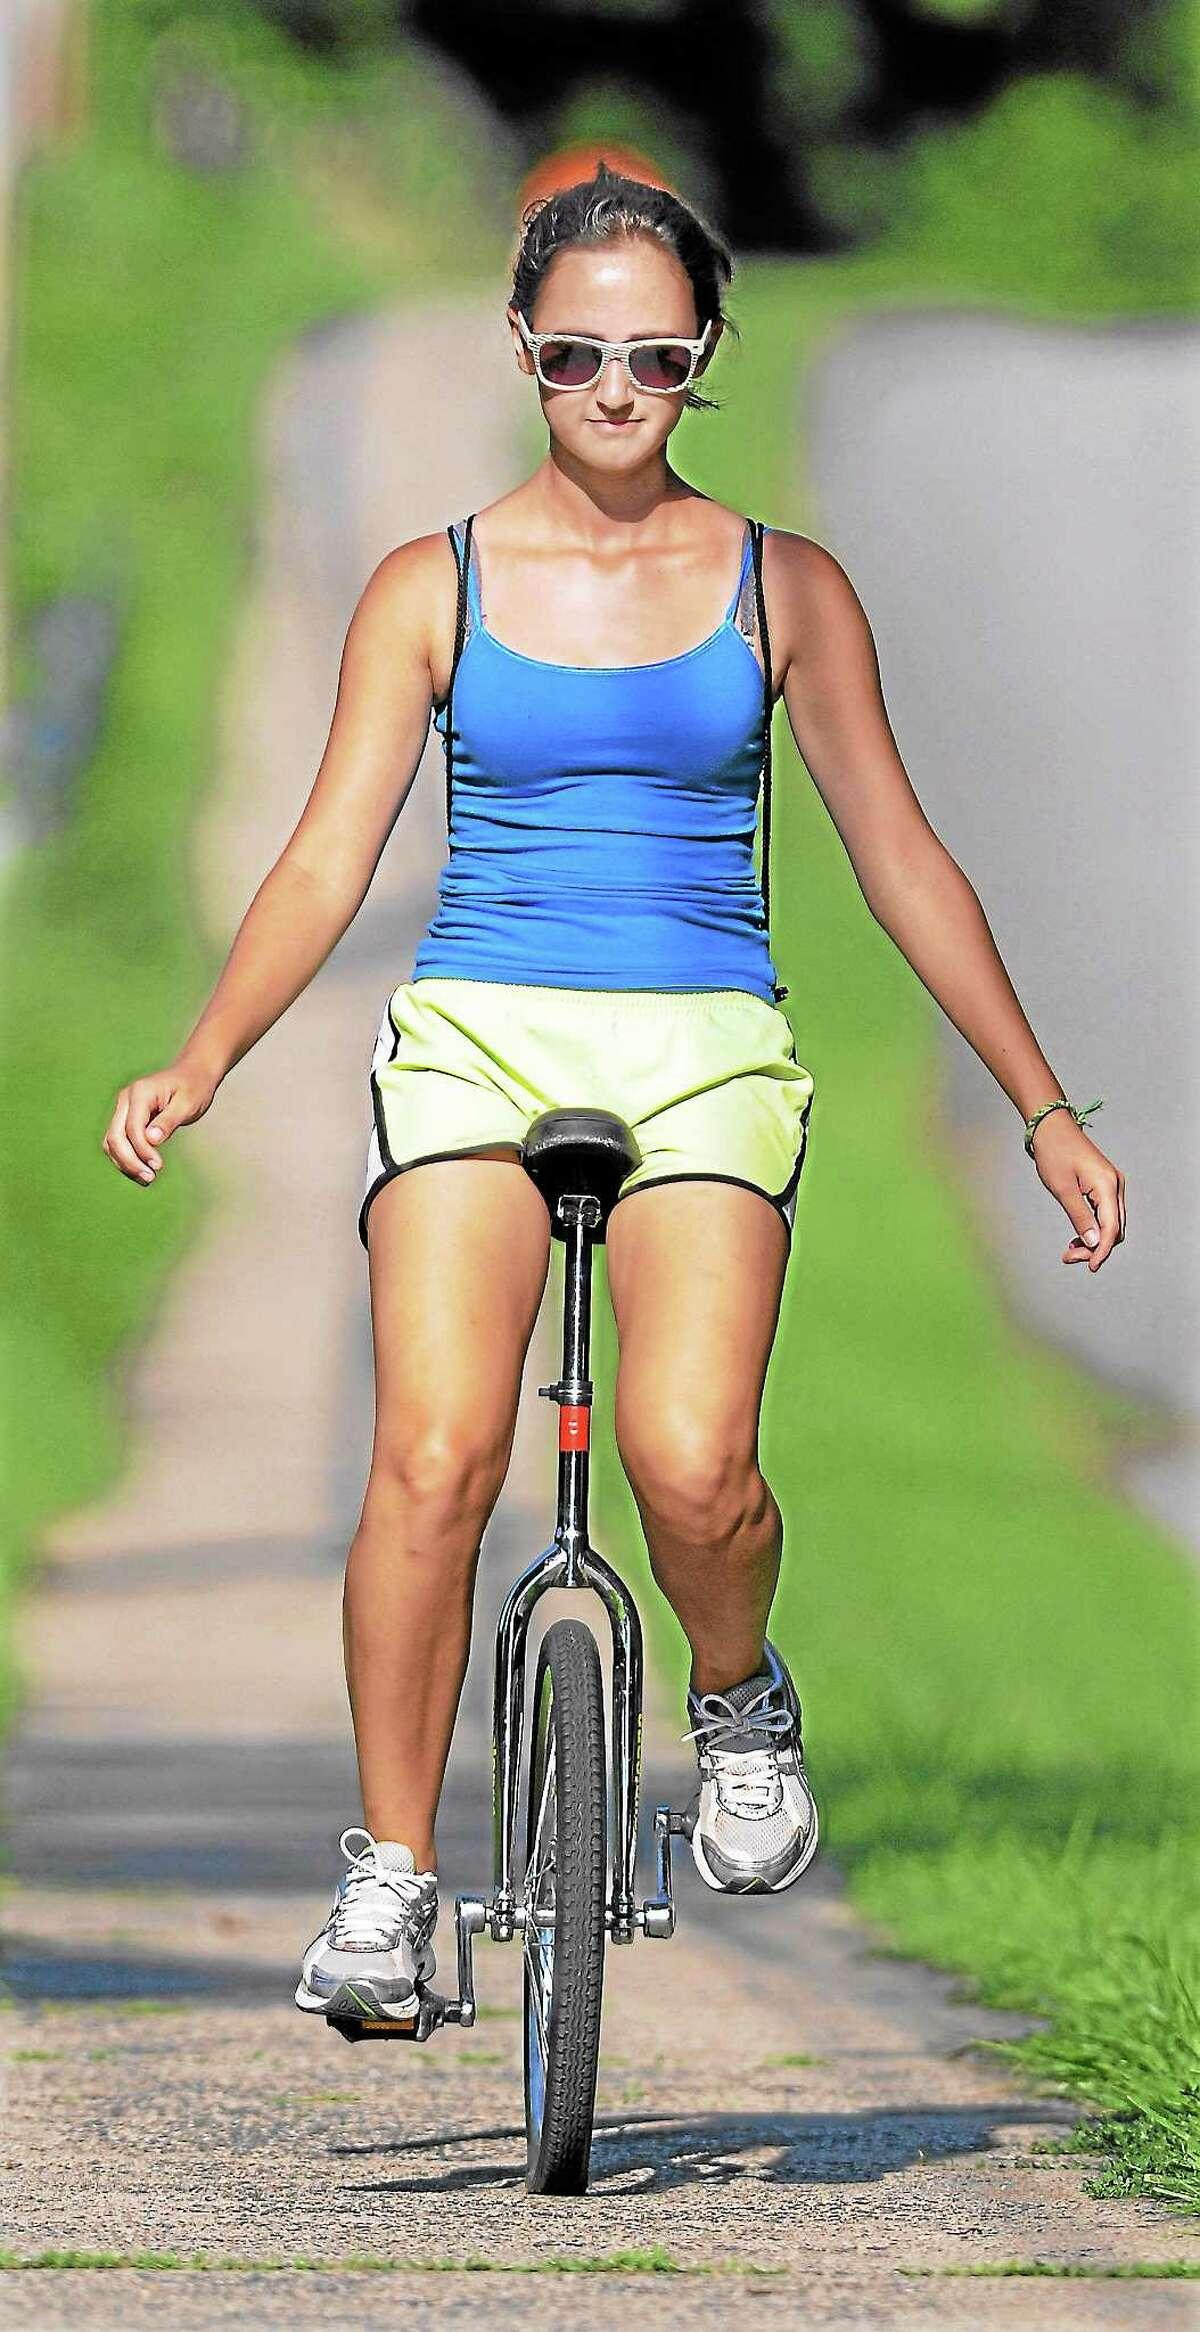 Eva Varszegi rides her unicycle down Wadsworth Street in Middletown.